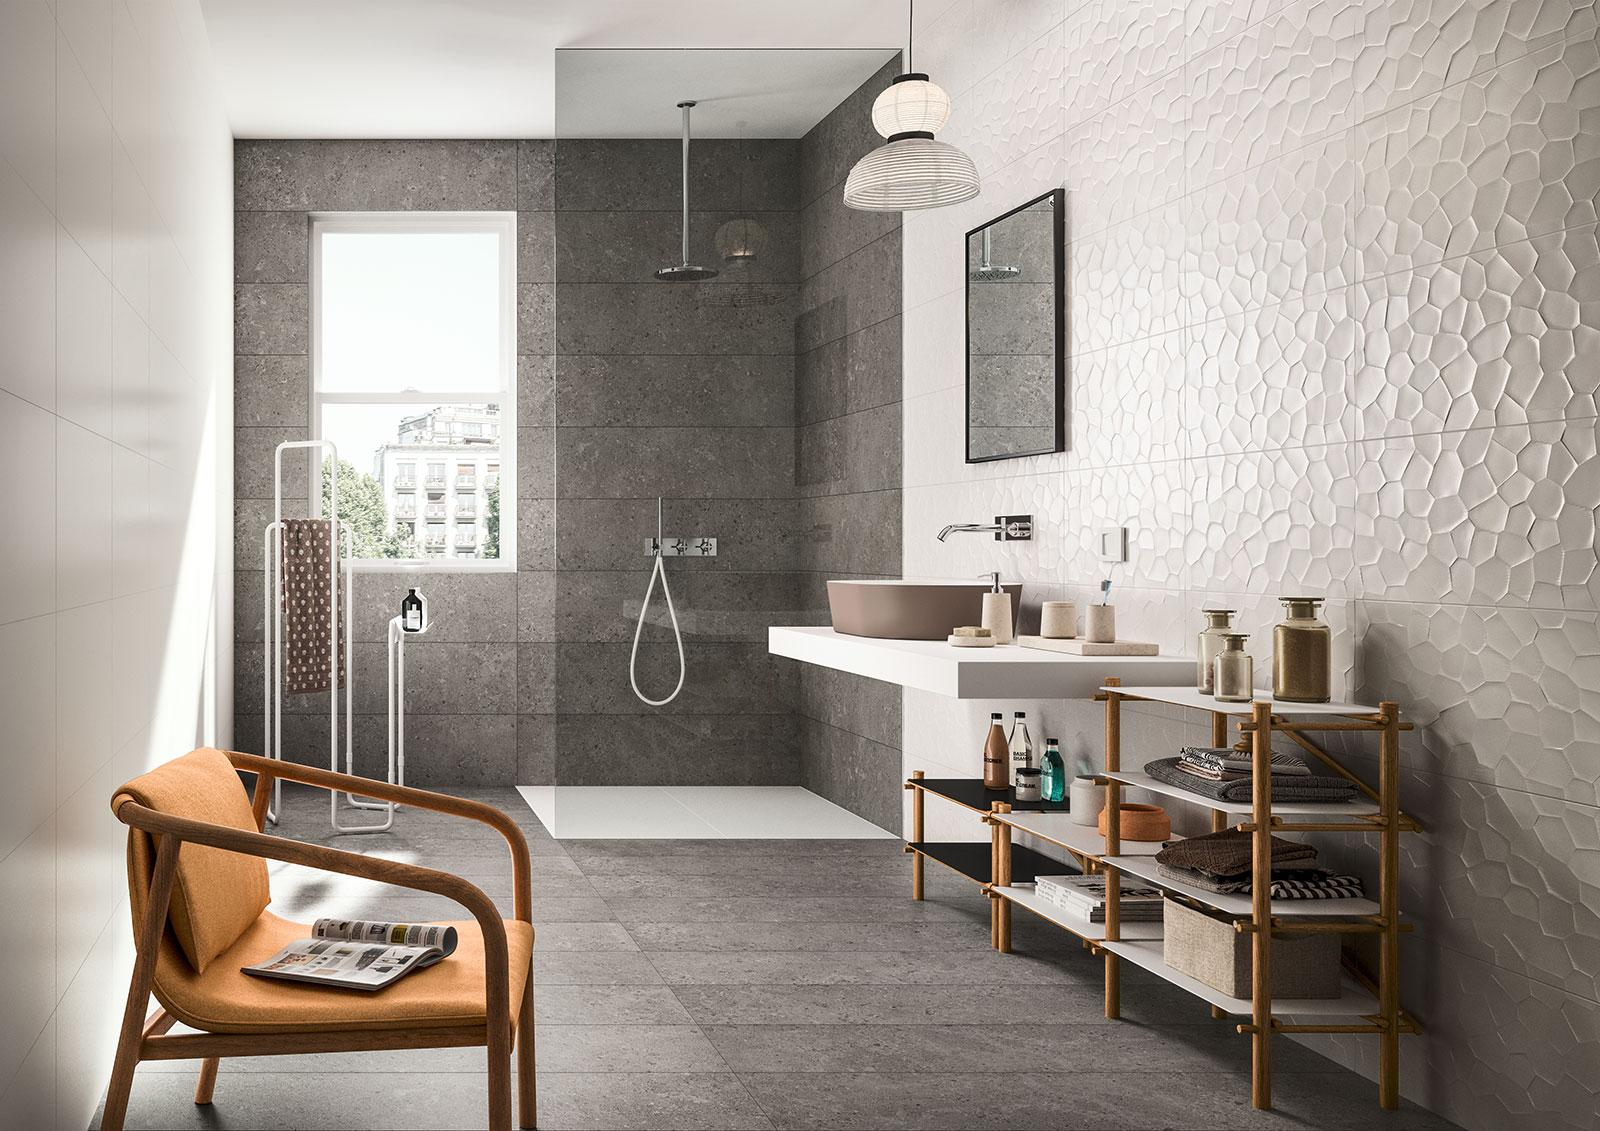 Color code minimal style wall tiles marazzi for Carrelage marazzi